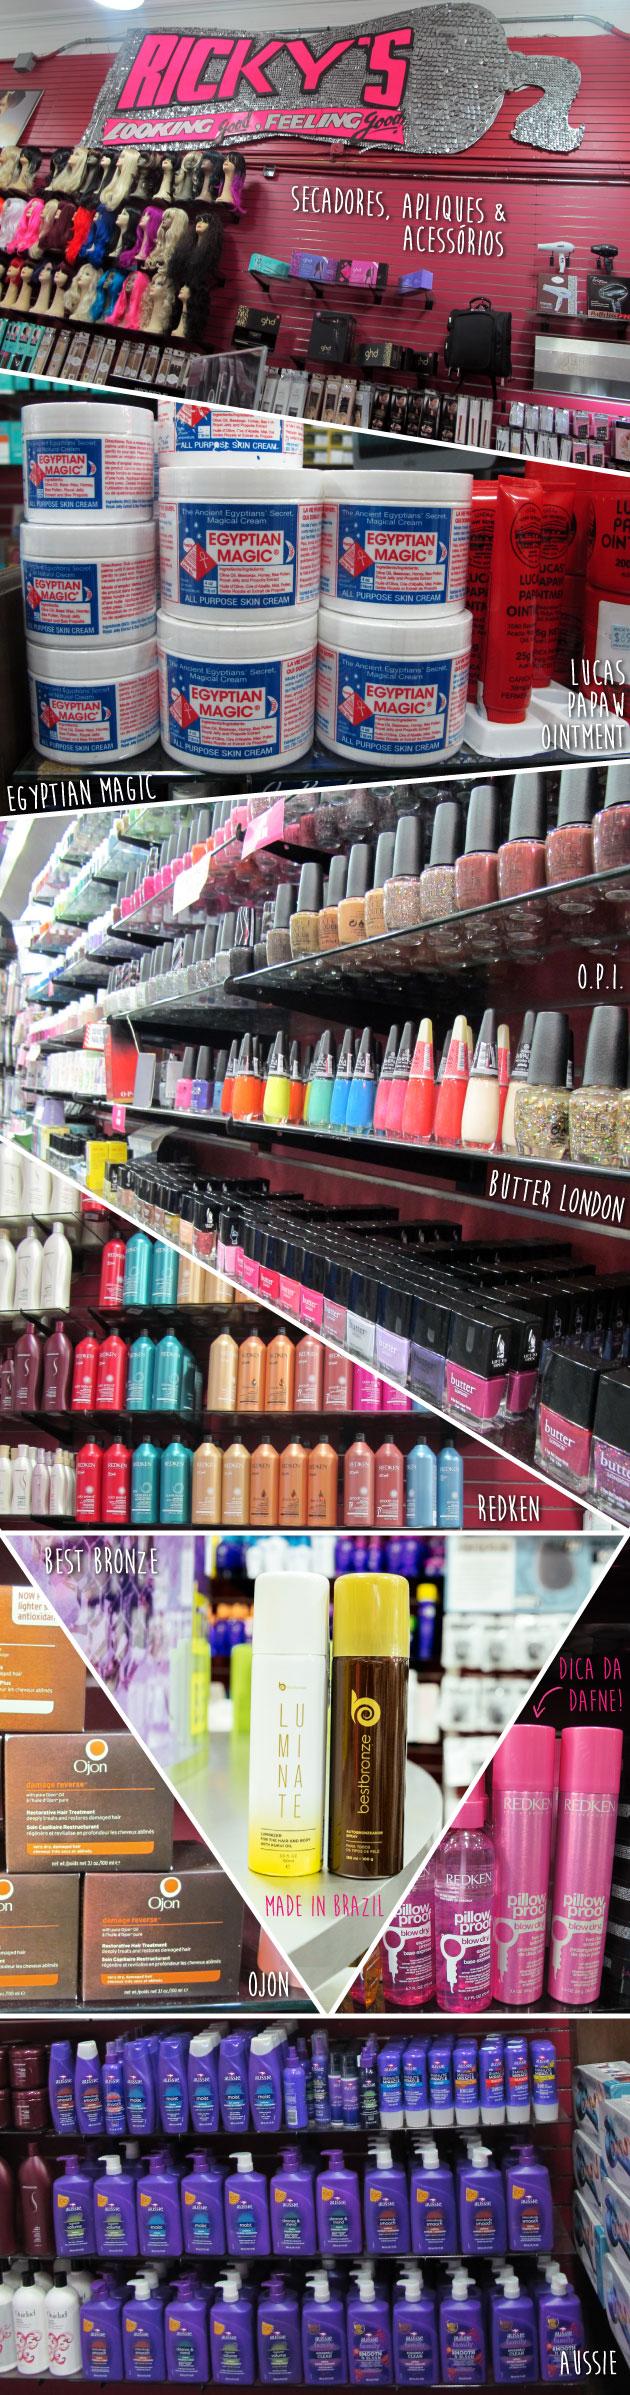 Rickys-NYC-loja-compras-cabelo-beleza-cosmeticos-pefumaria-esmaltes-shampoos-compras-NYFW-Fhits-Best-Bronze-Aussie-Redken-Ojon-